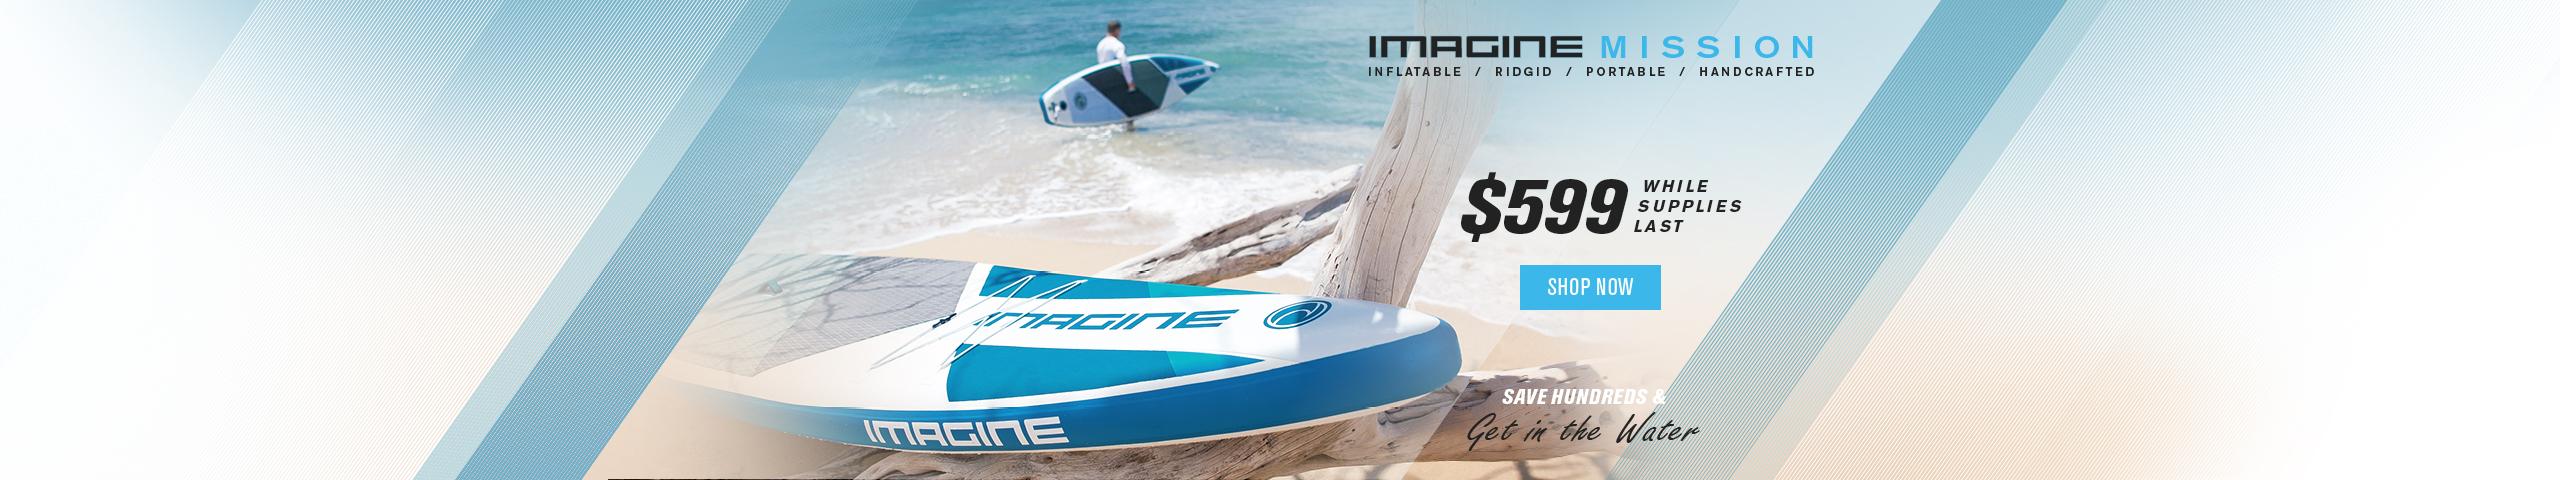 Imagine Mission LTE On Sale